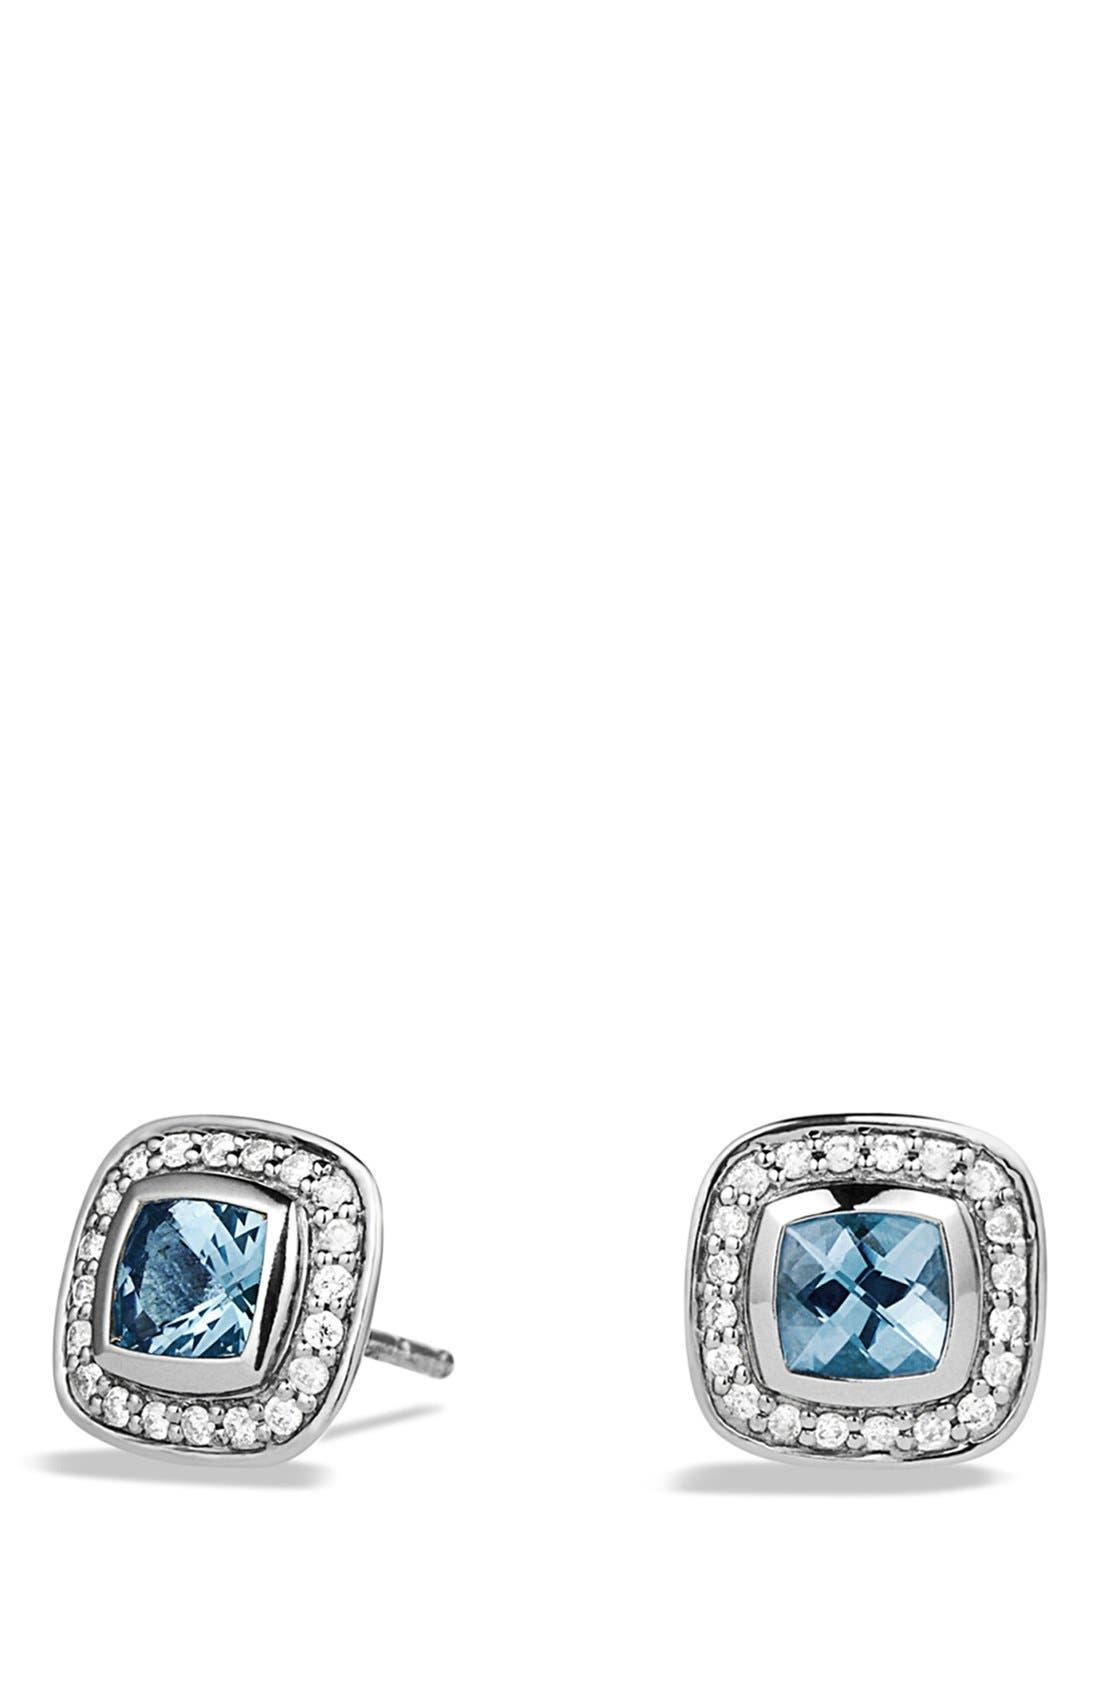 Main Image - David Yurman 'Albion' Petite Earrings with Diamonds